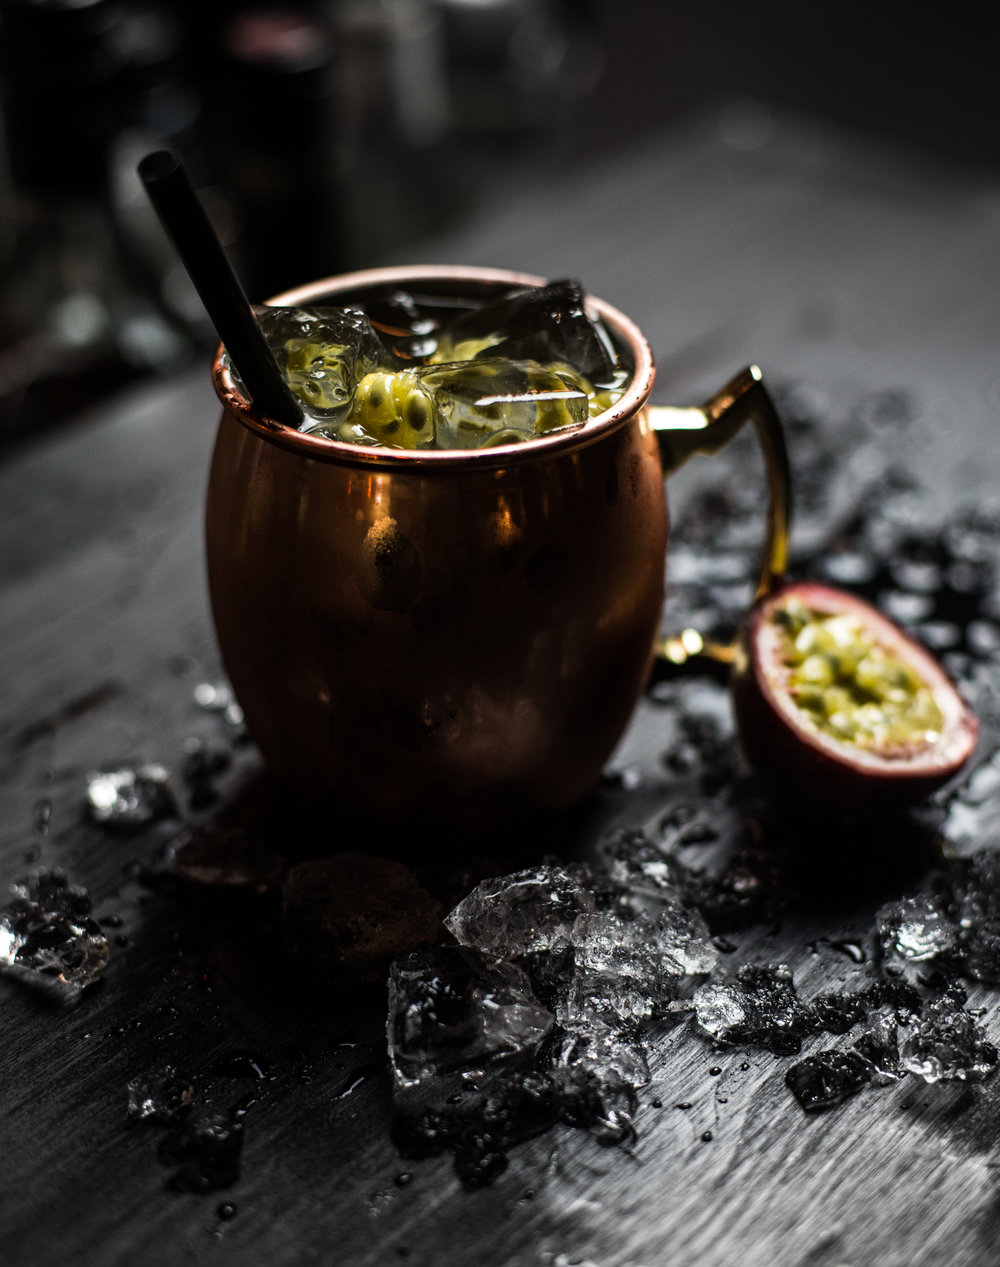 Drinks Chuchu shot by (c) Jahan Saber 3.jpg